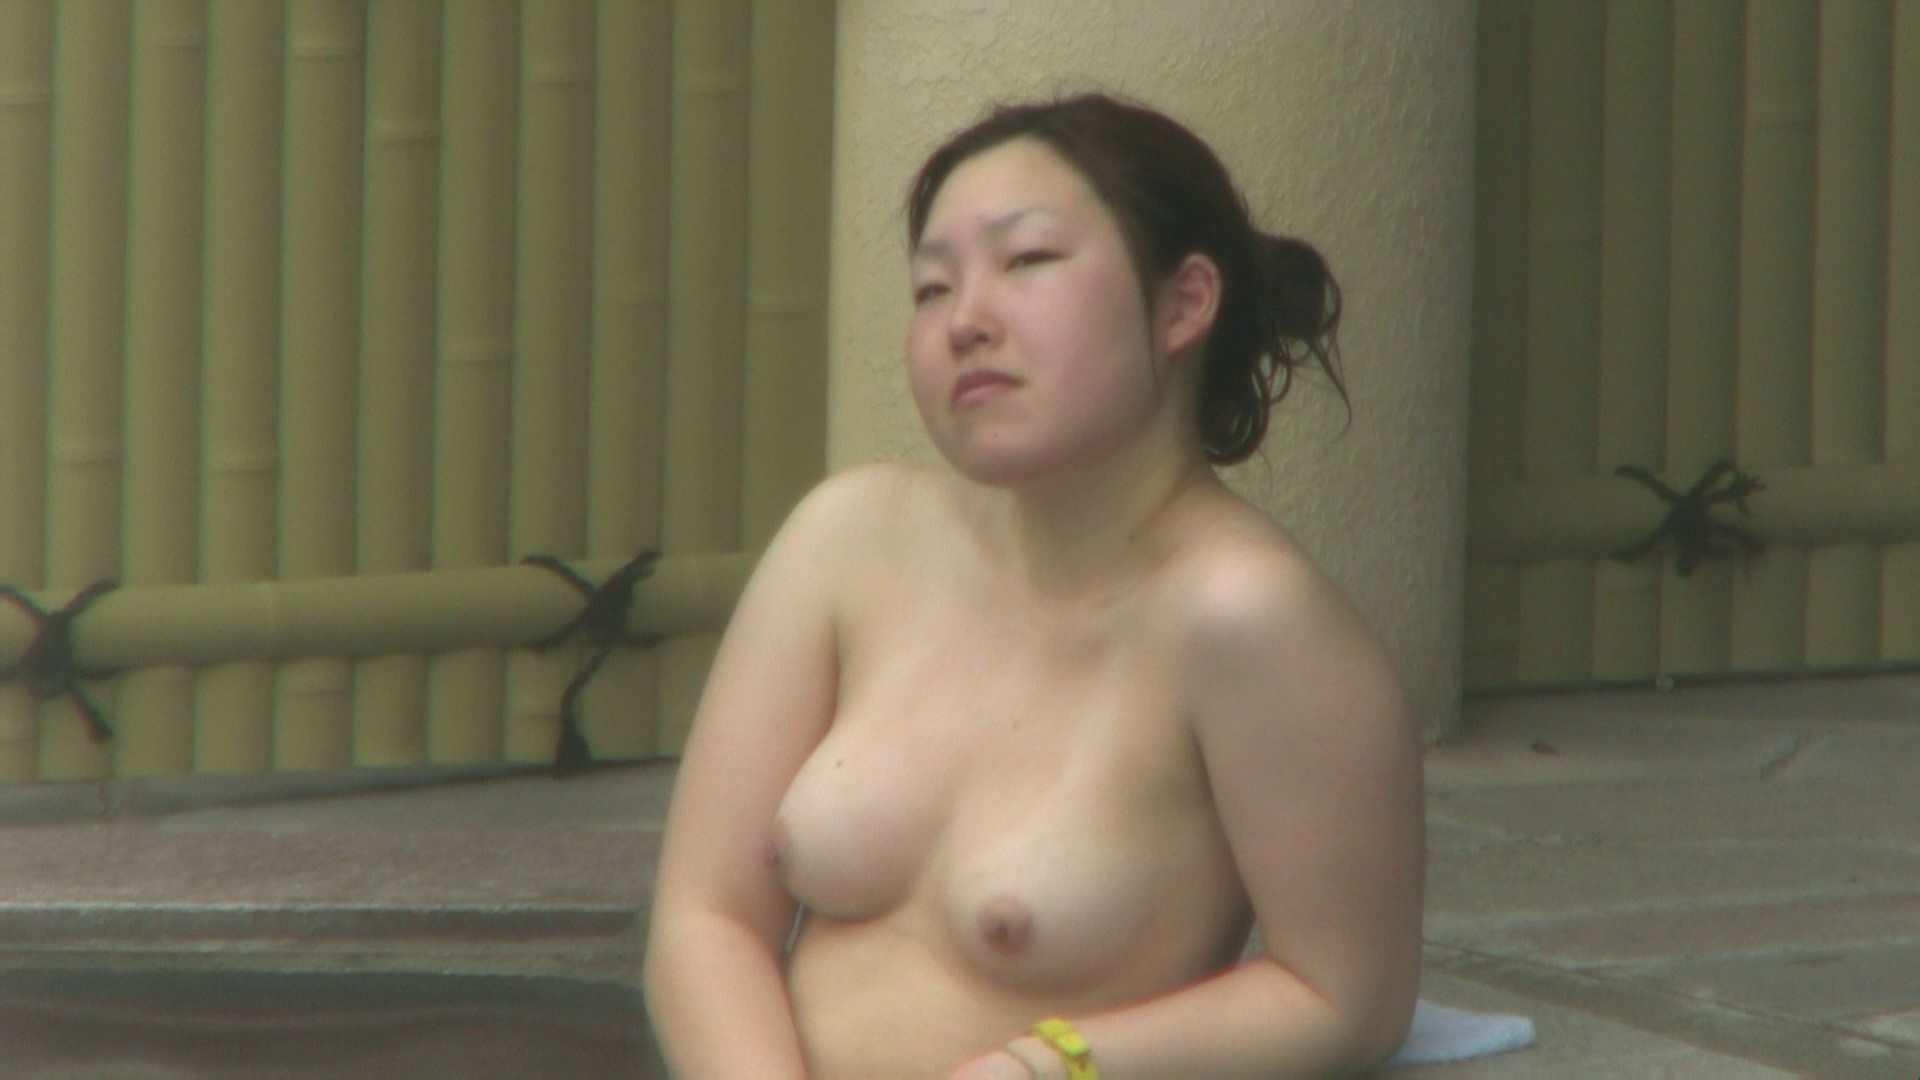 Aquaな露天風呂Vol.72【VIP限定】 露天風呂突入 | 盗撮師作品  76pic 67